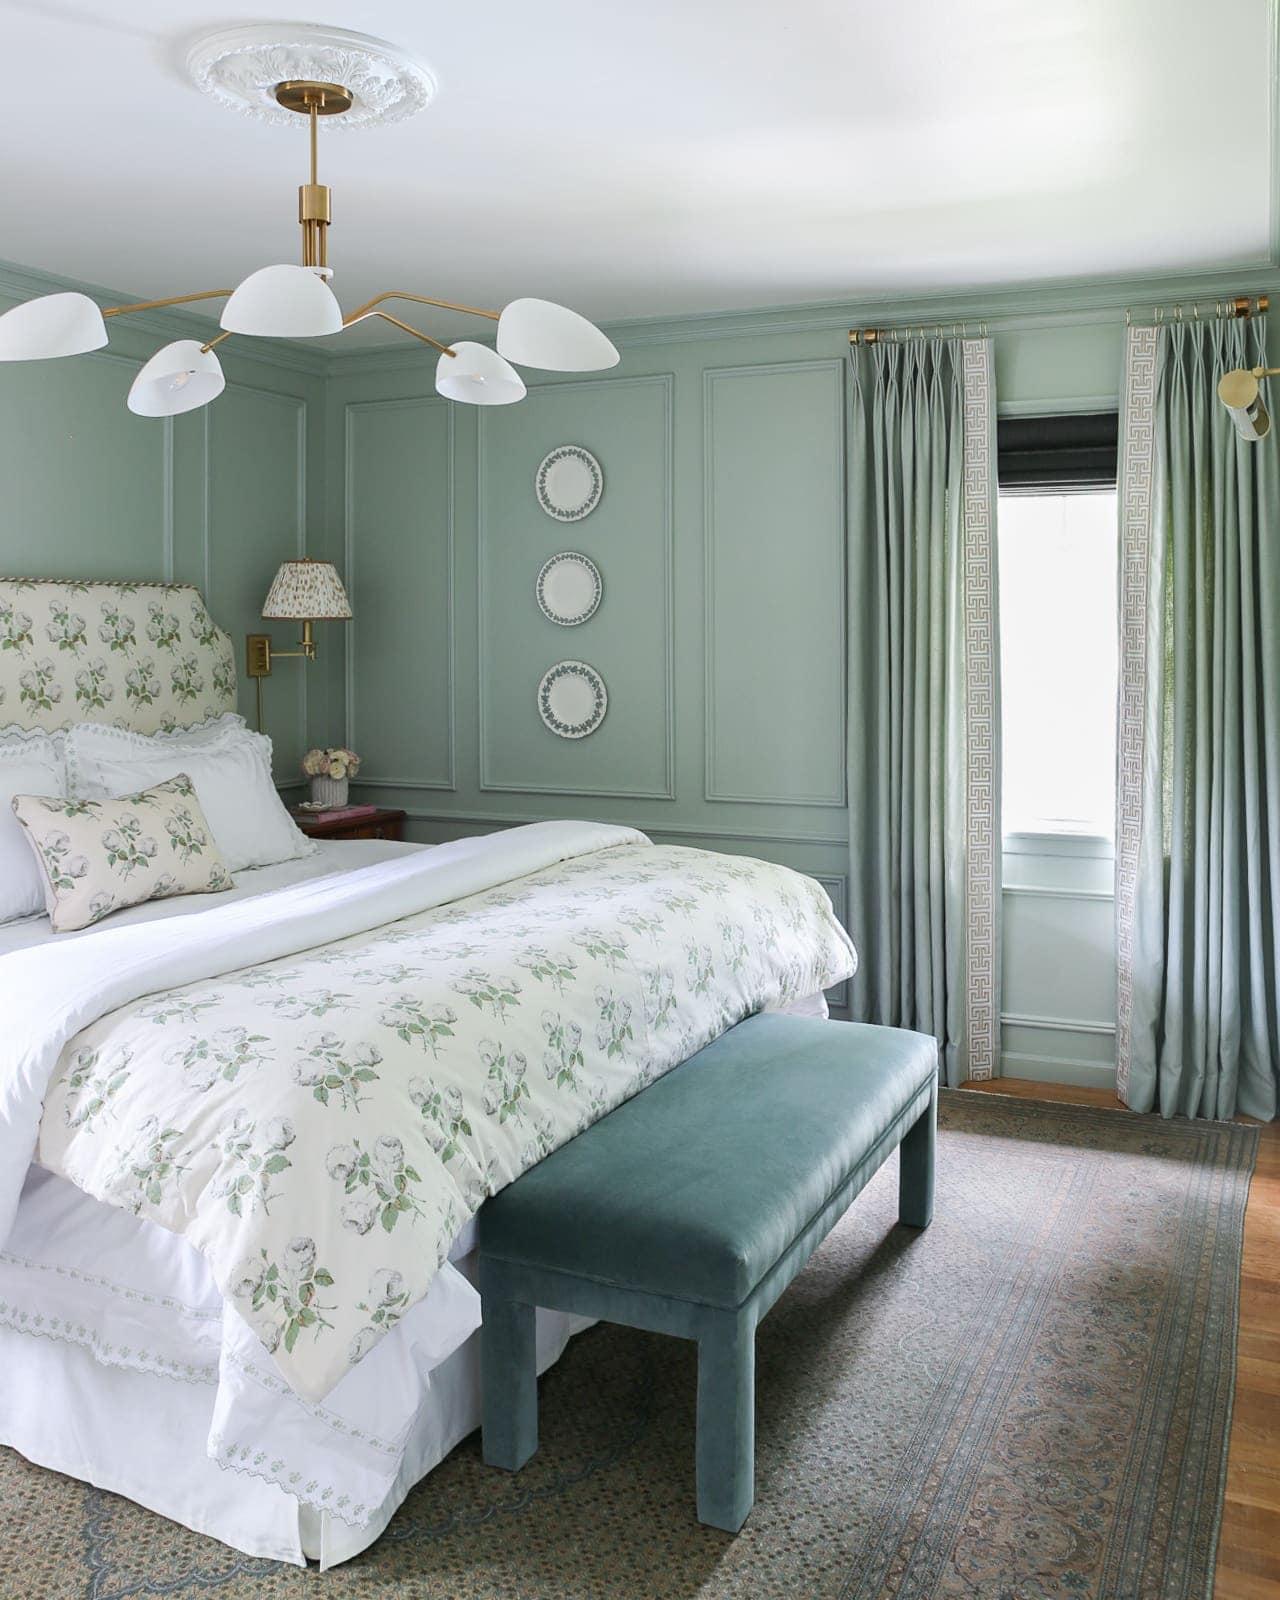 grandmillennial-bedroom-blue-green-walls